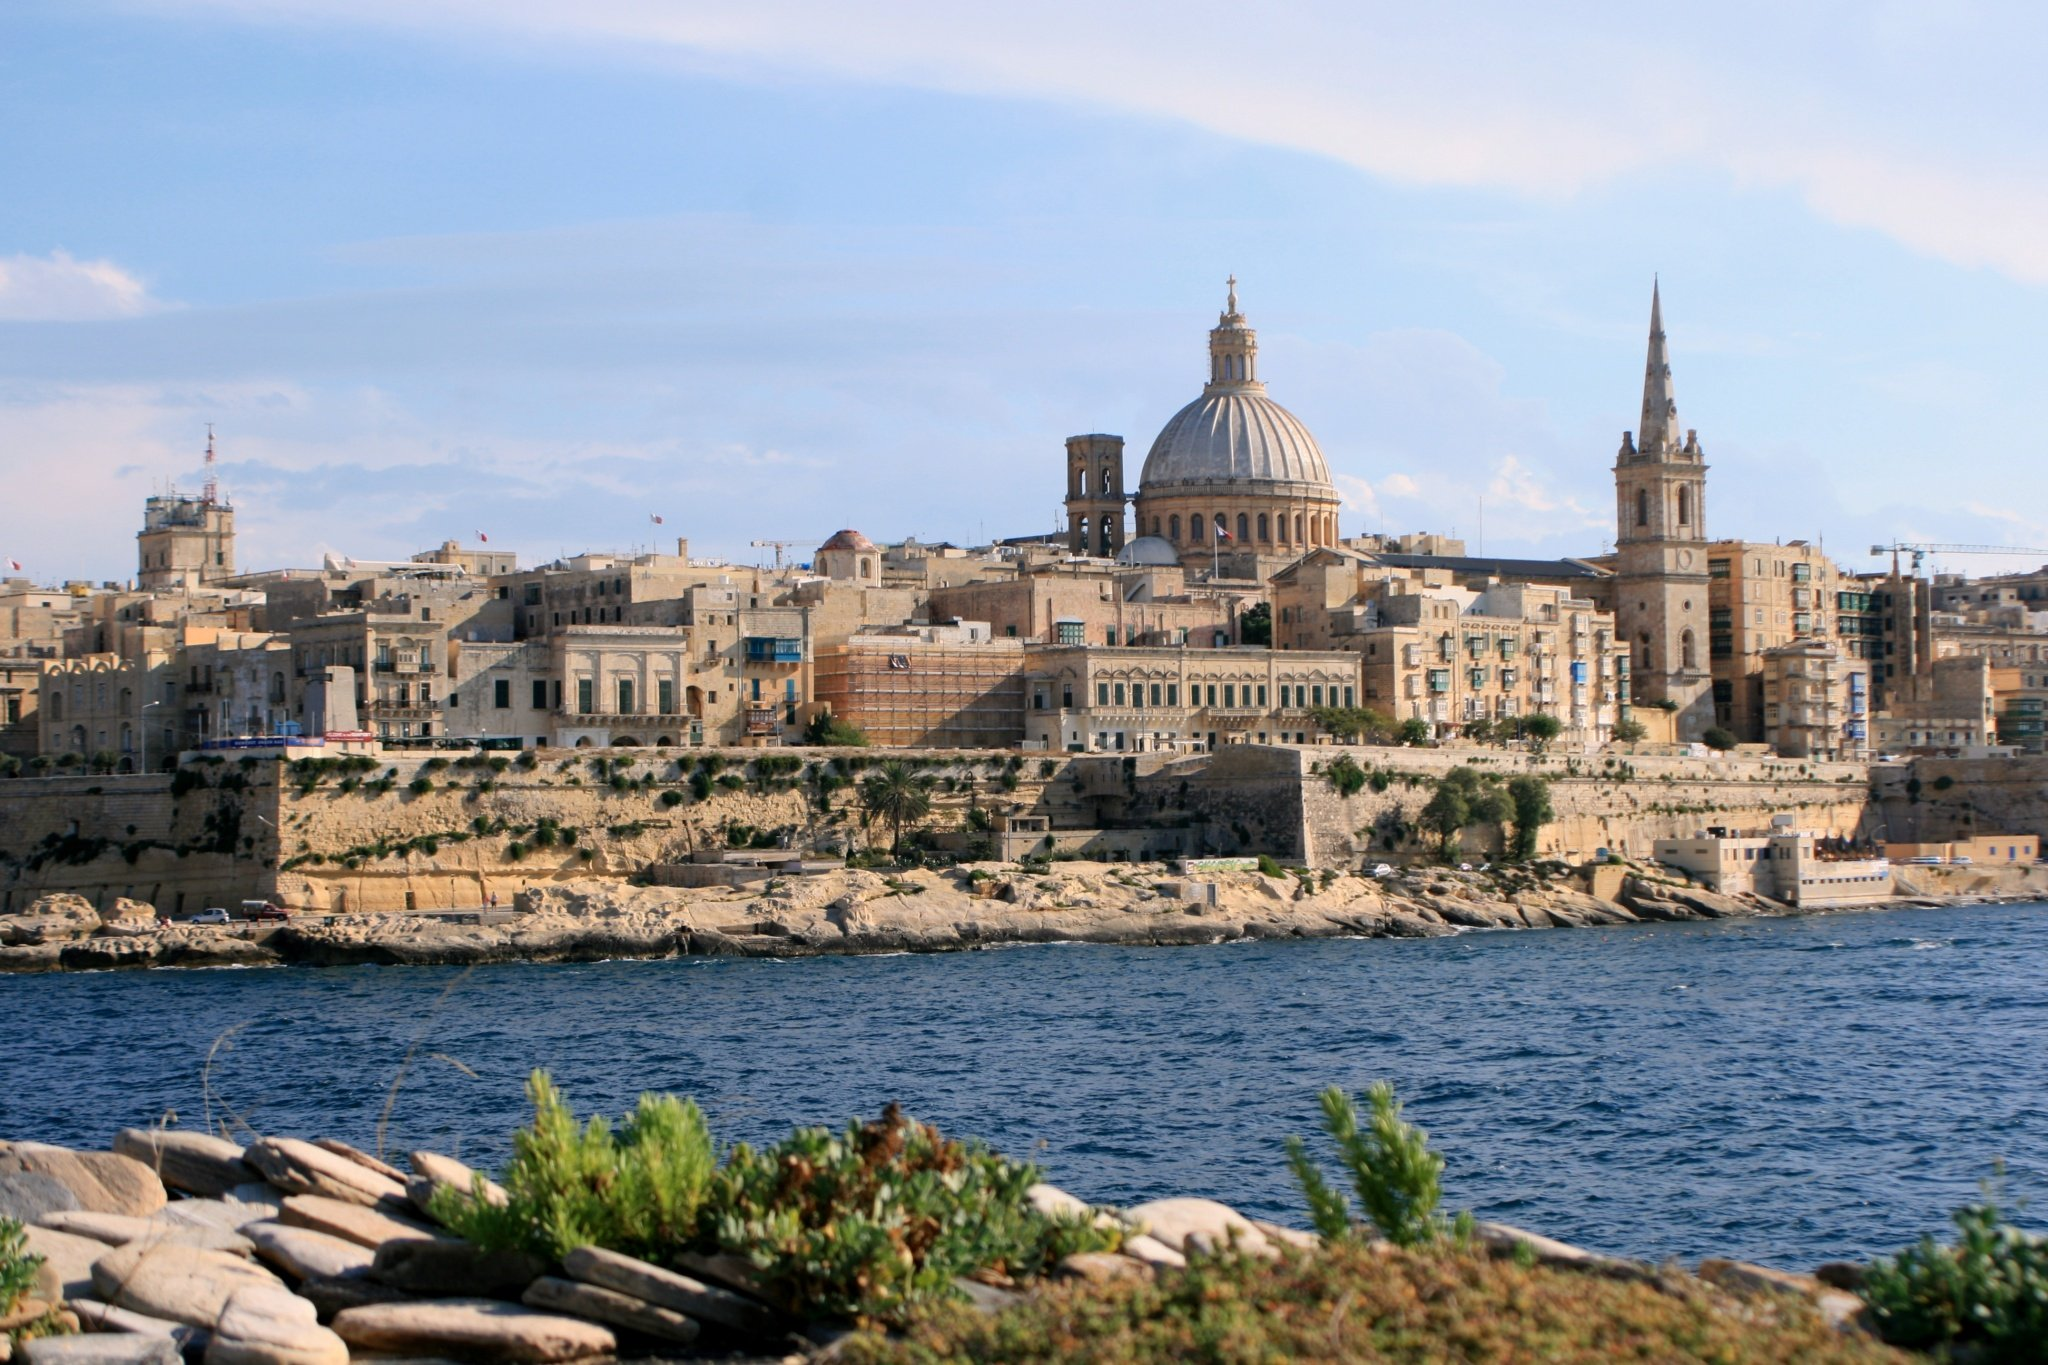 Expat Story: Malta Through Lithuanian Eyes